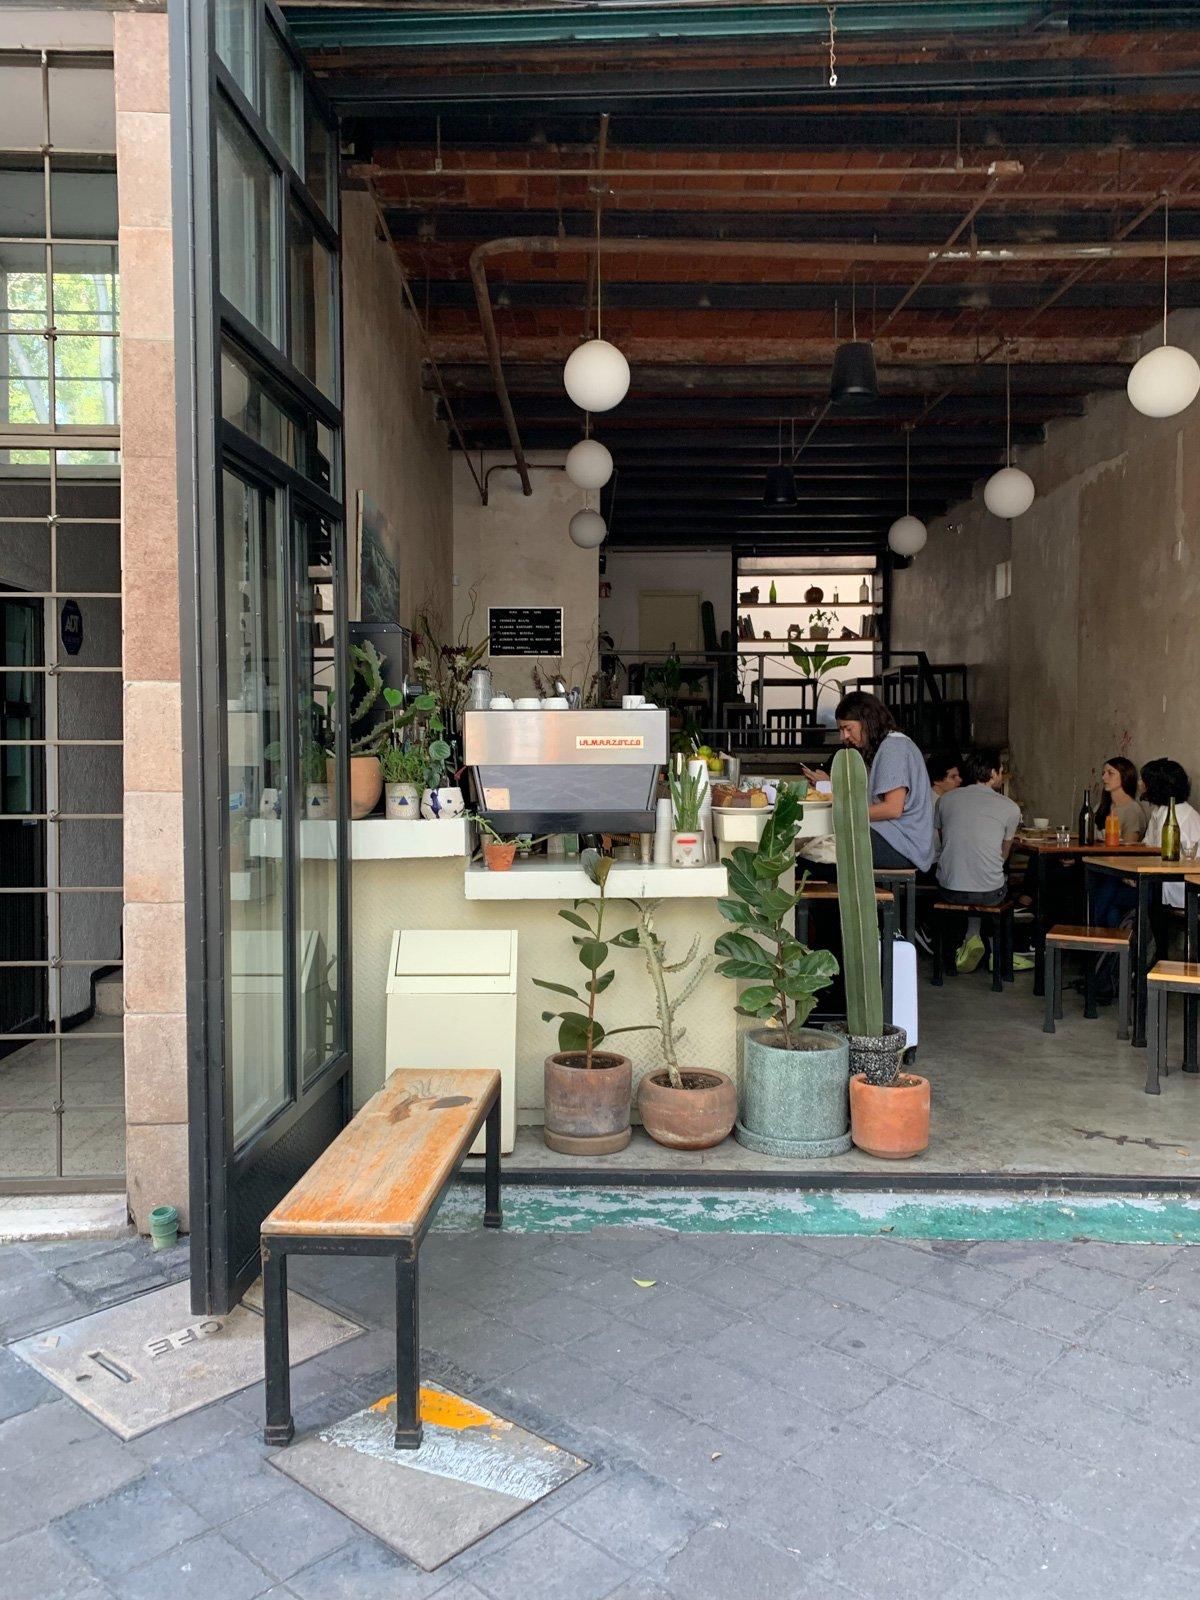 Coffee Shop in Mexico City